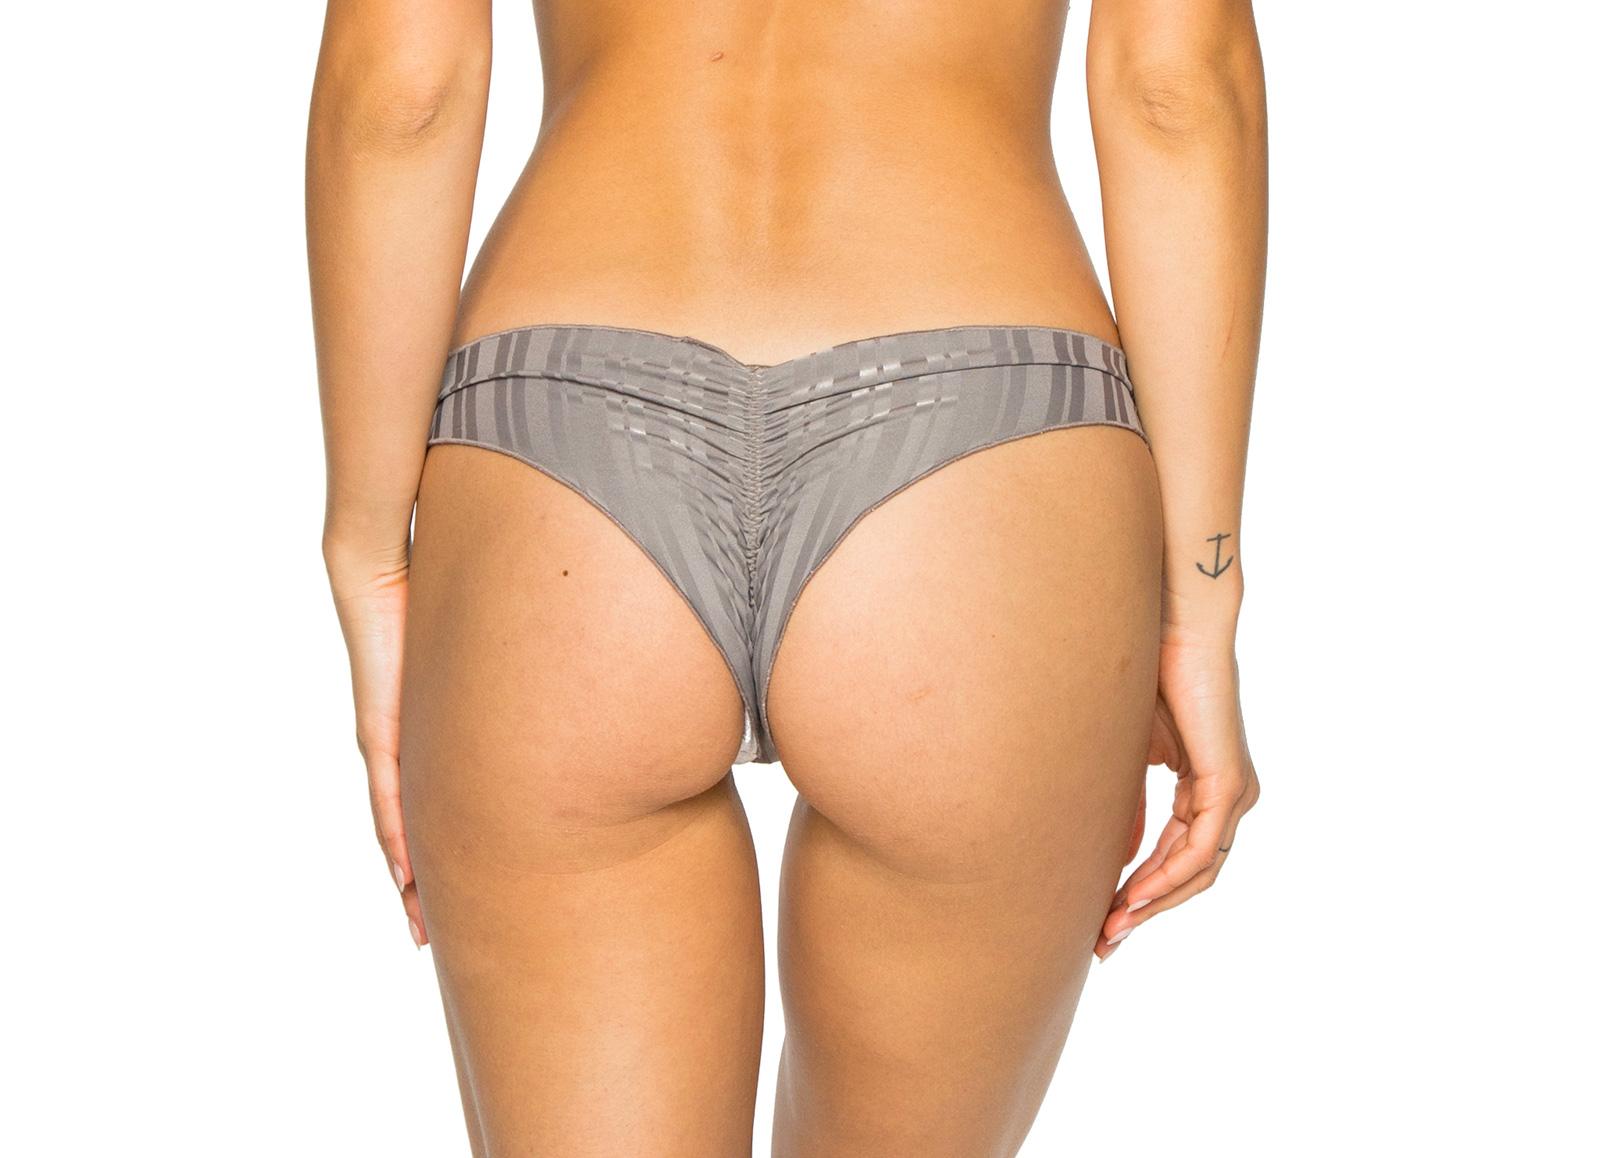 875461022d9 ... Grey scrunch bikini bottom with ring details - BOTTOM RUCHED GREY TURI  TURAI ...